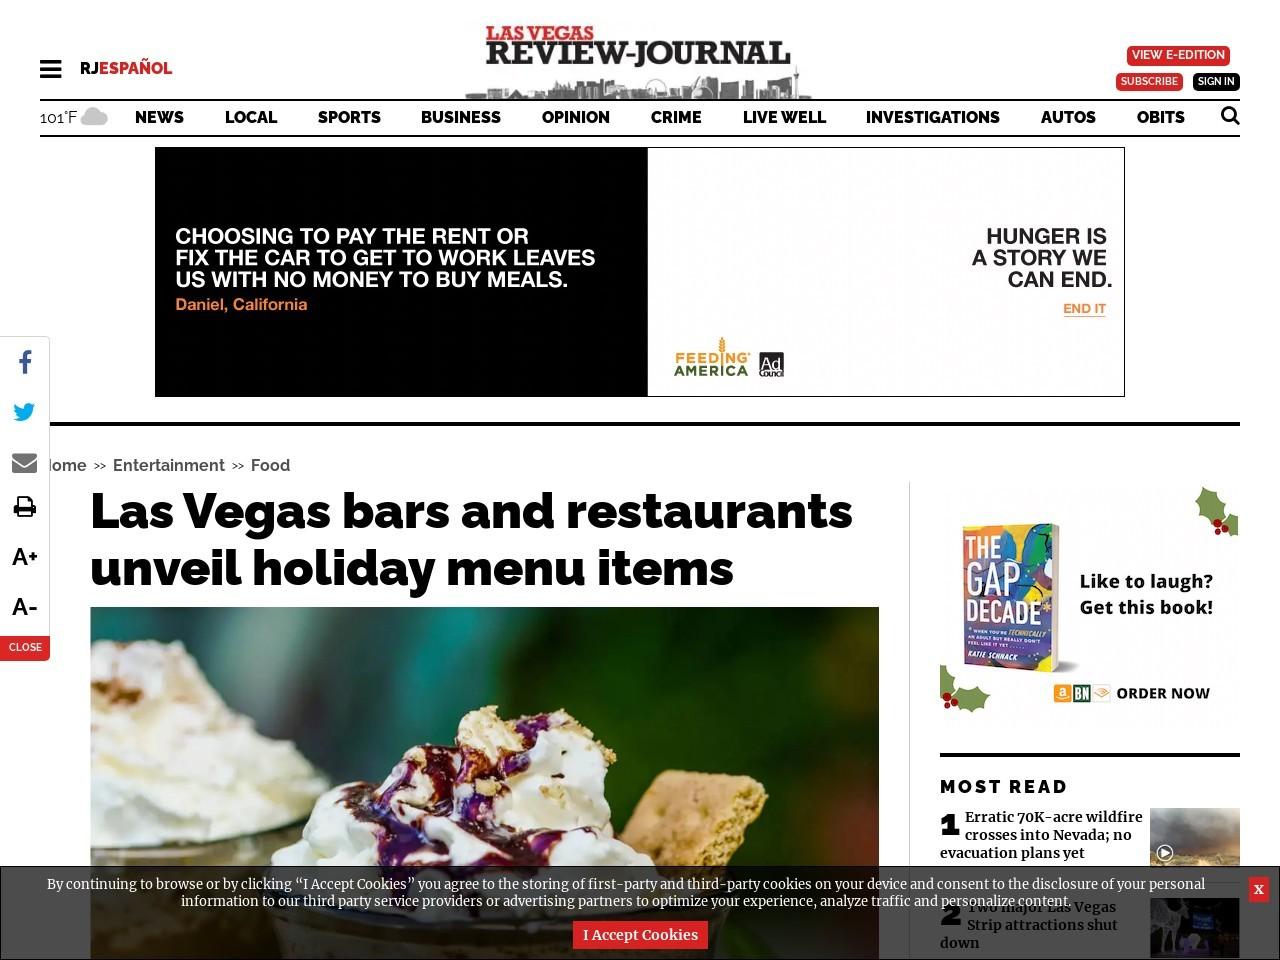 Las Vegas bars and restaurants unveil holiday menu items